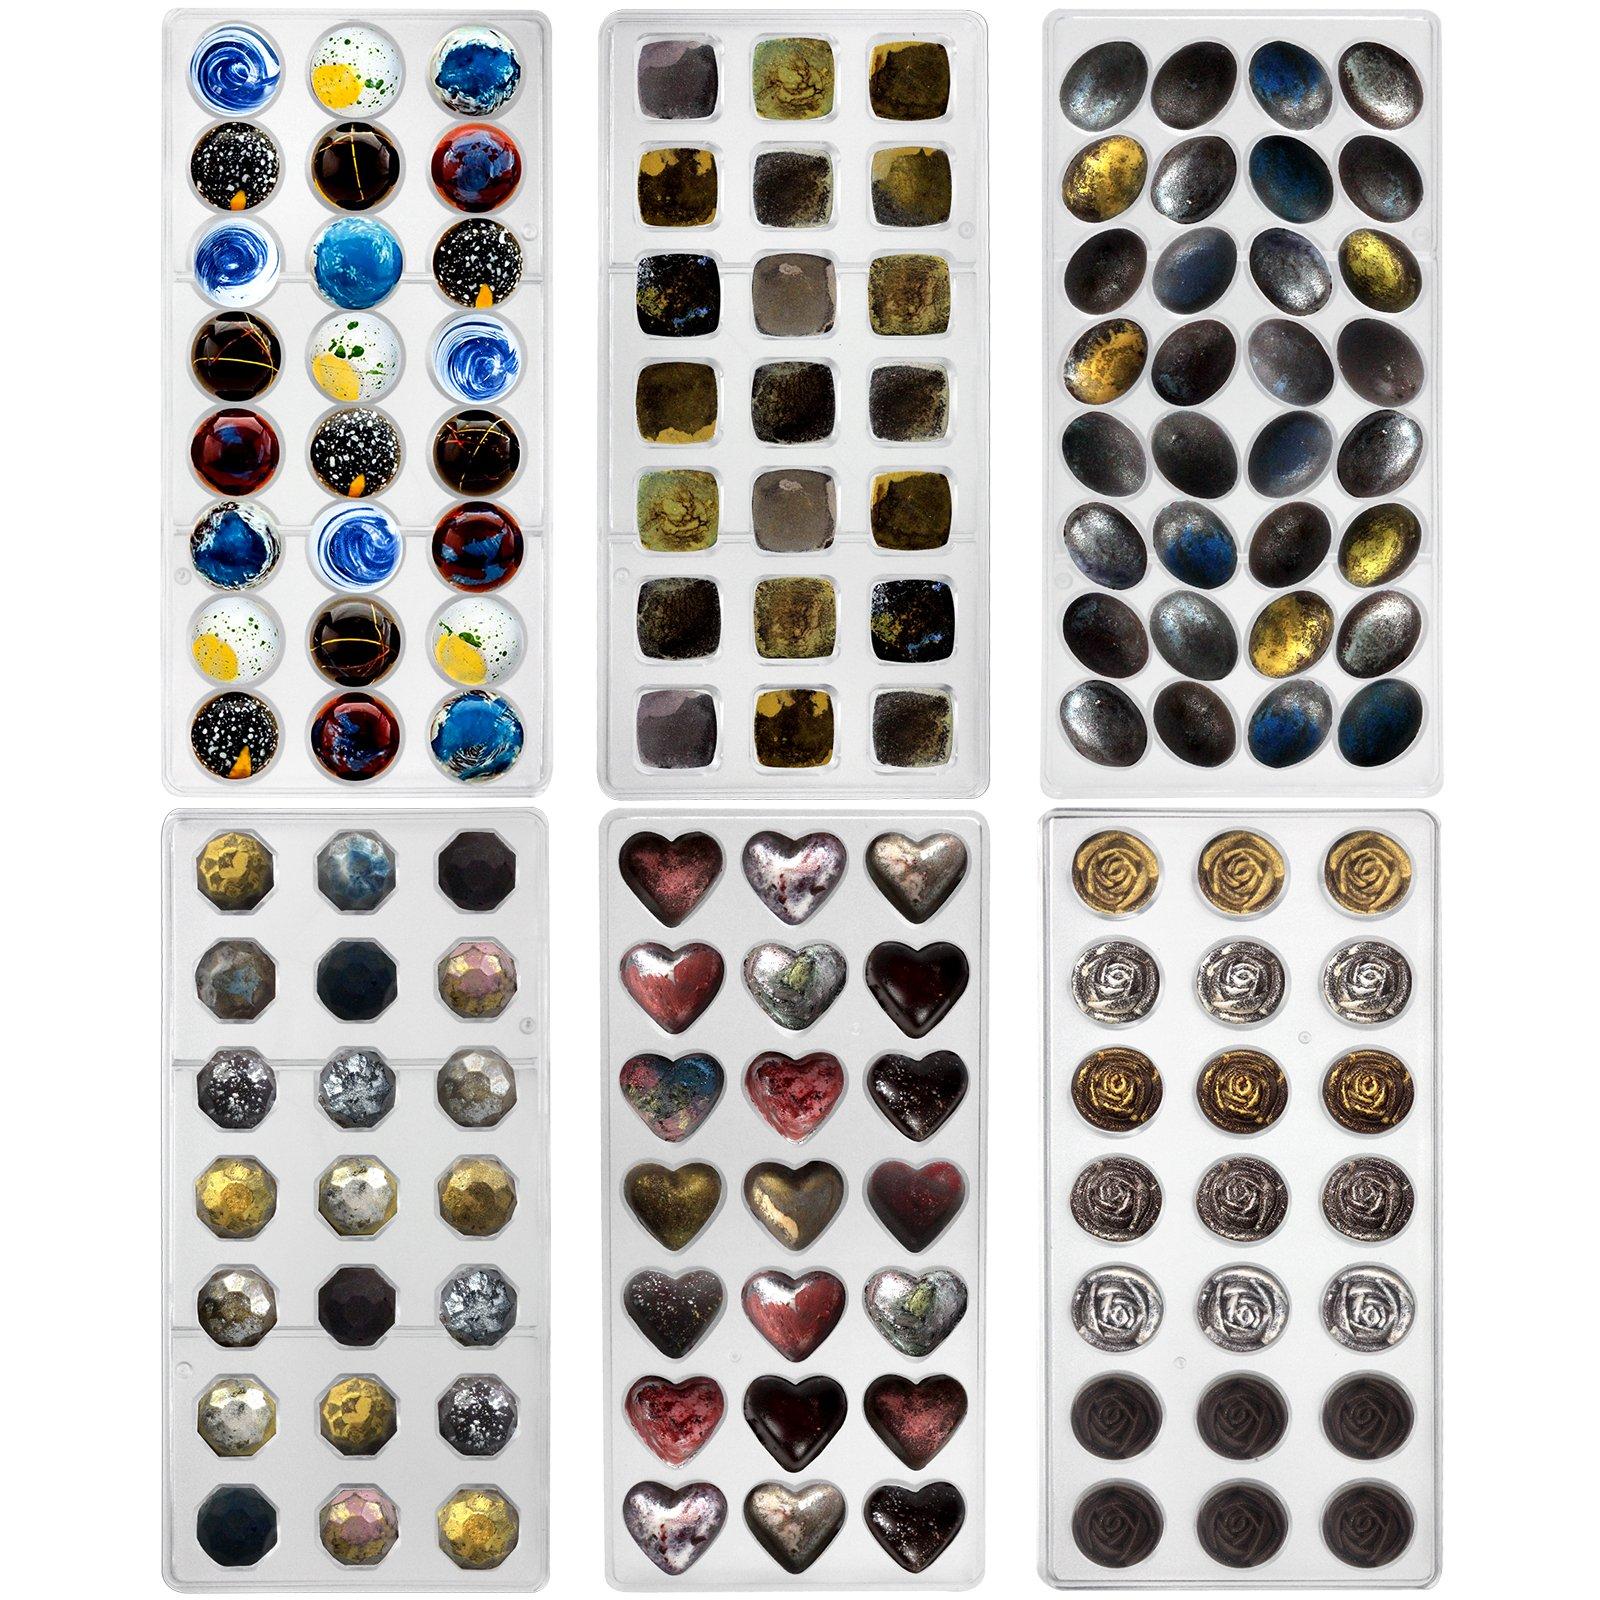 Funshowcase Rose, Heart, Dome, Diamond,Oval Shape Chocolate Mold Plastic 6-piece Set Bite Size by FUNSHOWCASE (Image #1)